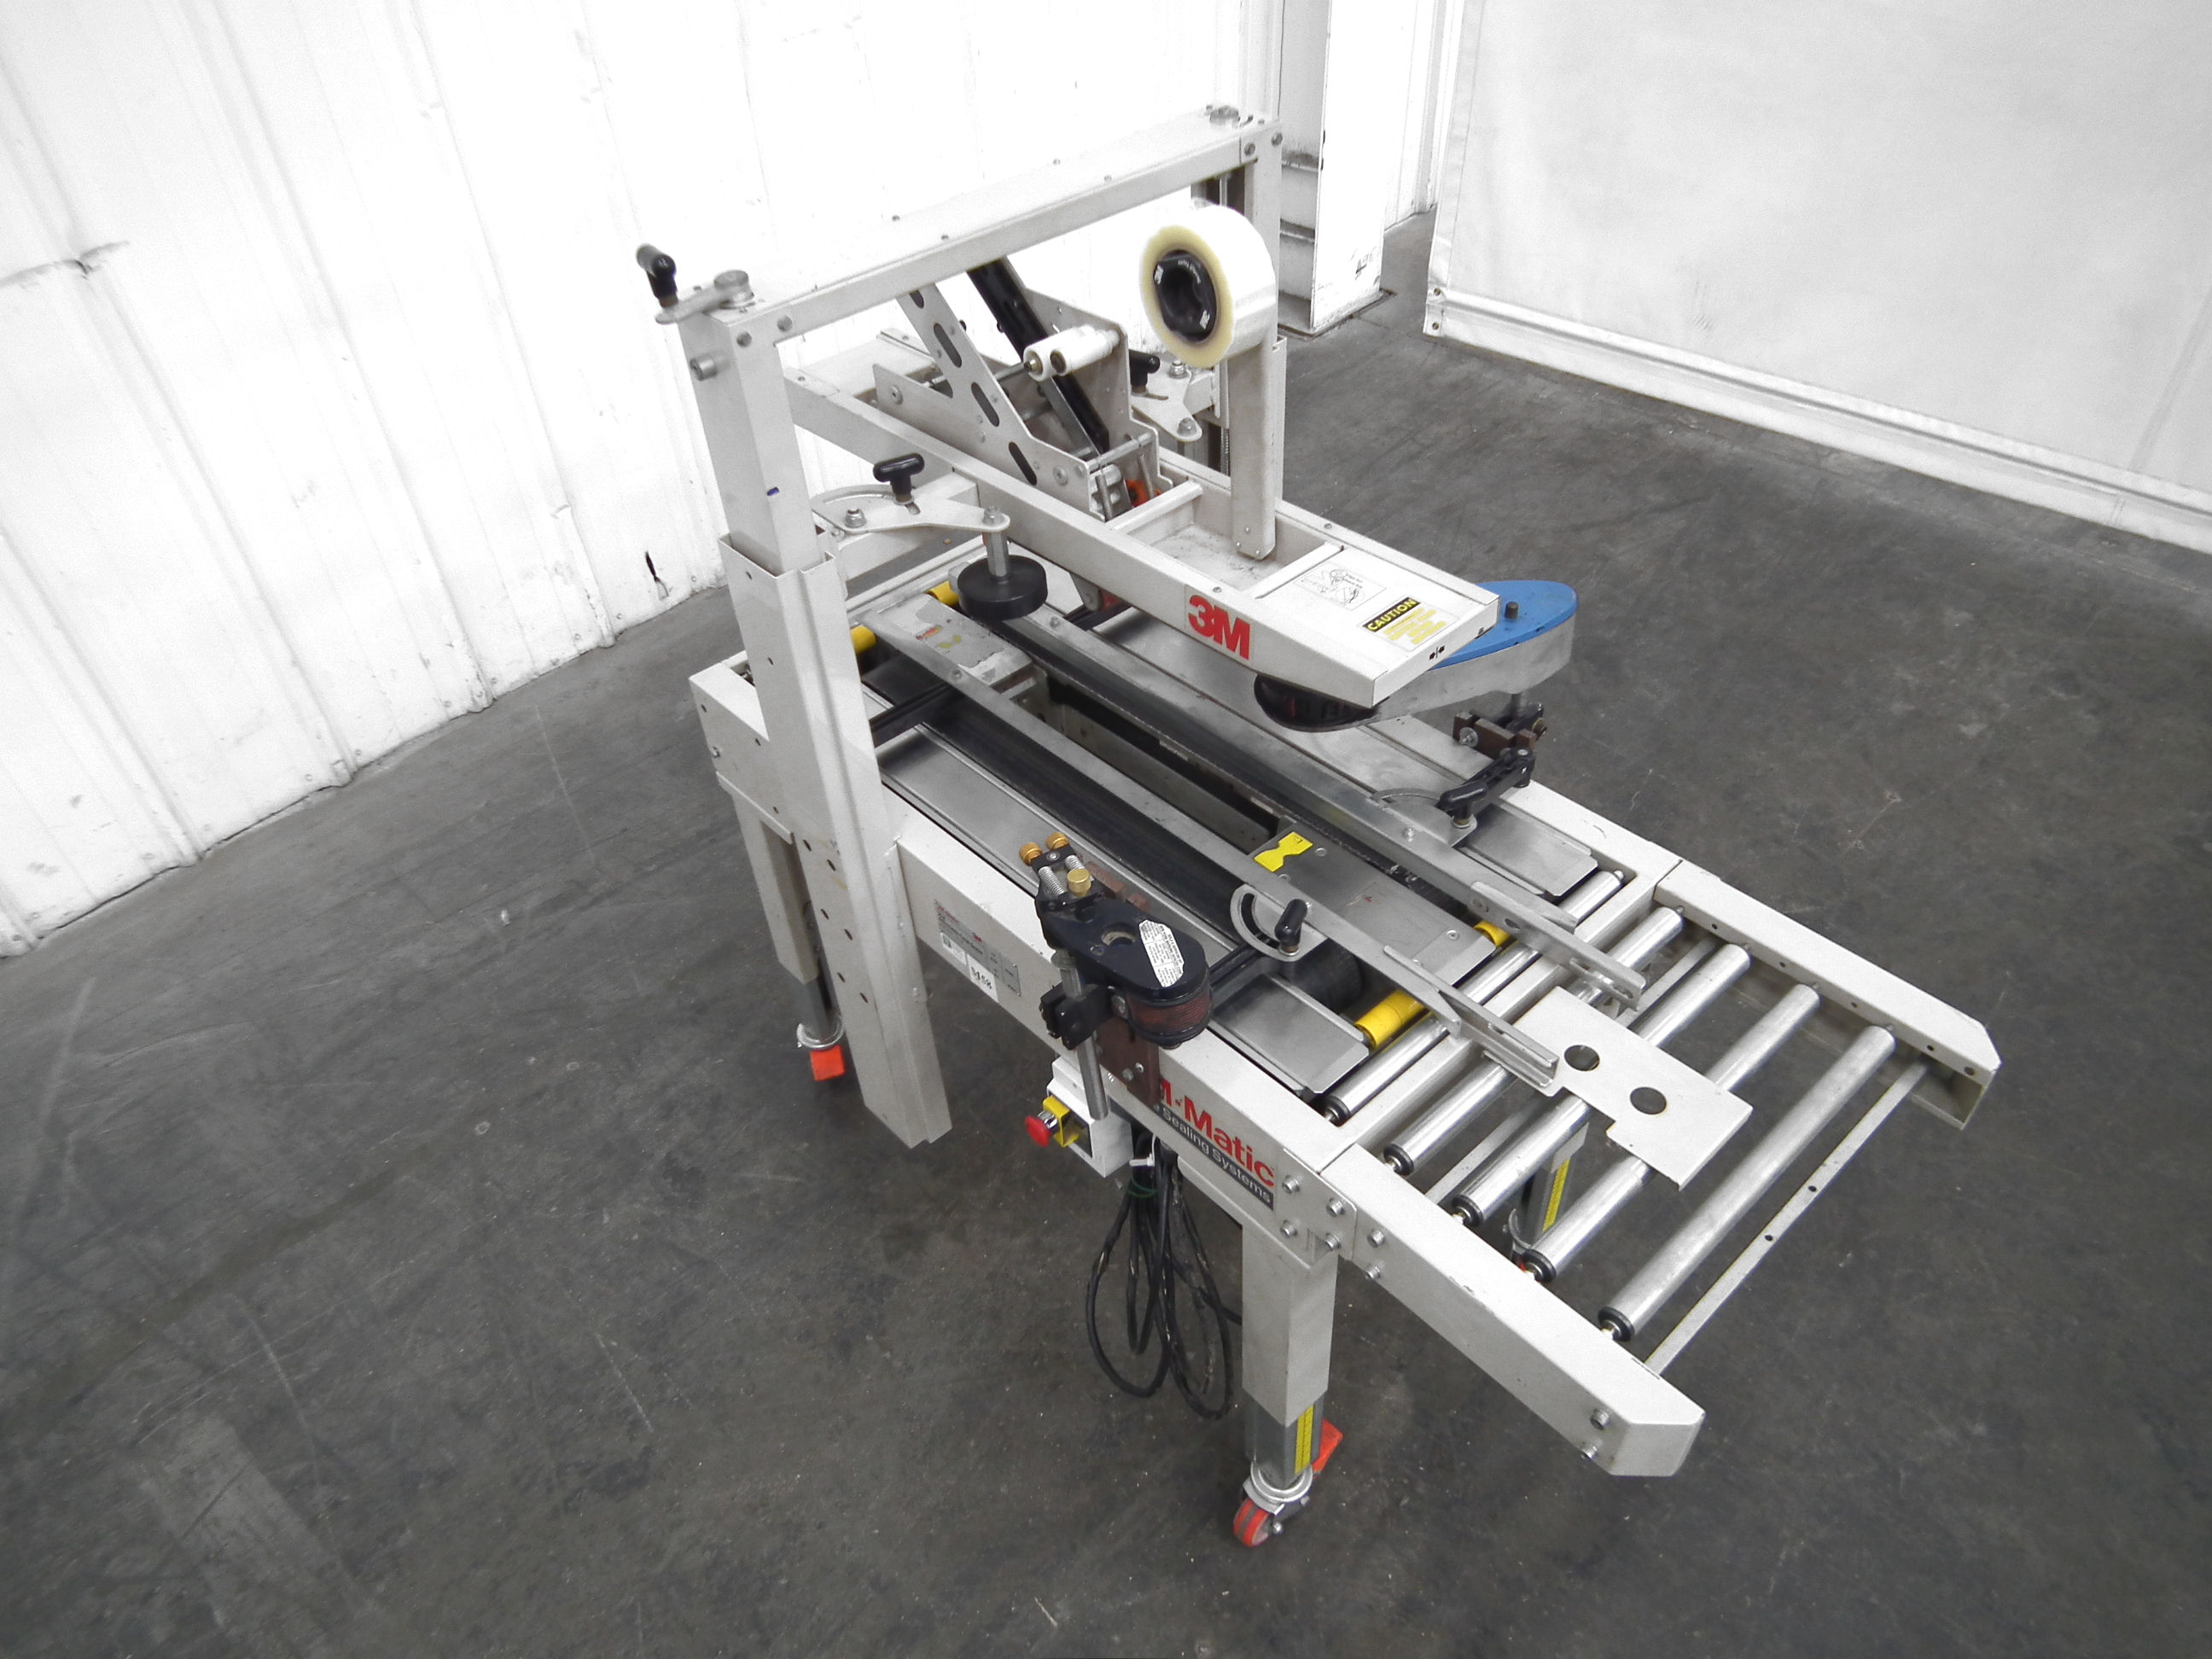 3M 22A Adjustable Case Sealer Type 28600 A7997 - Image 4 of 6